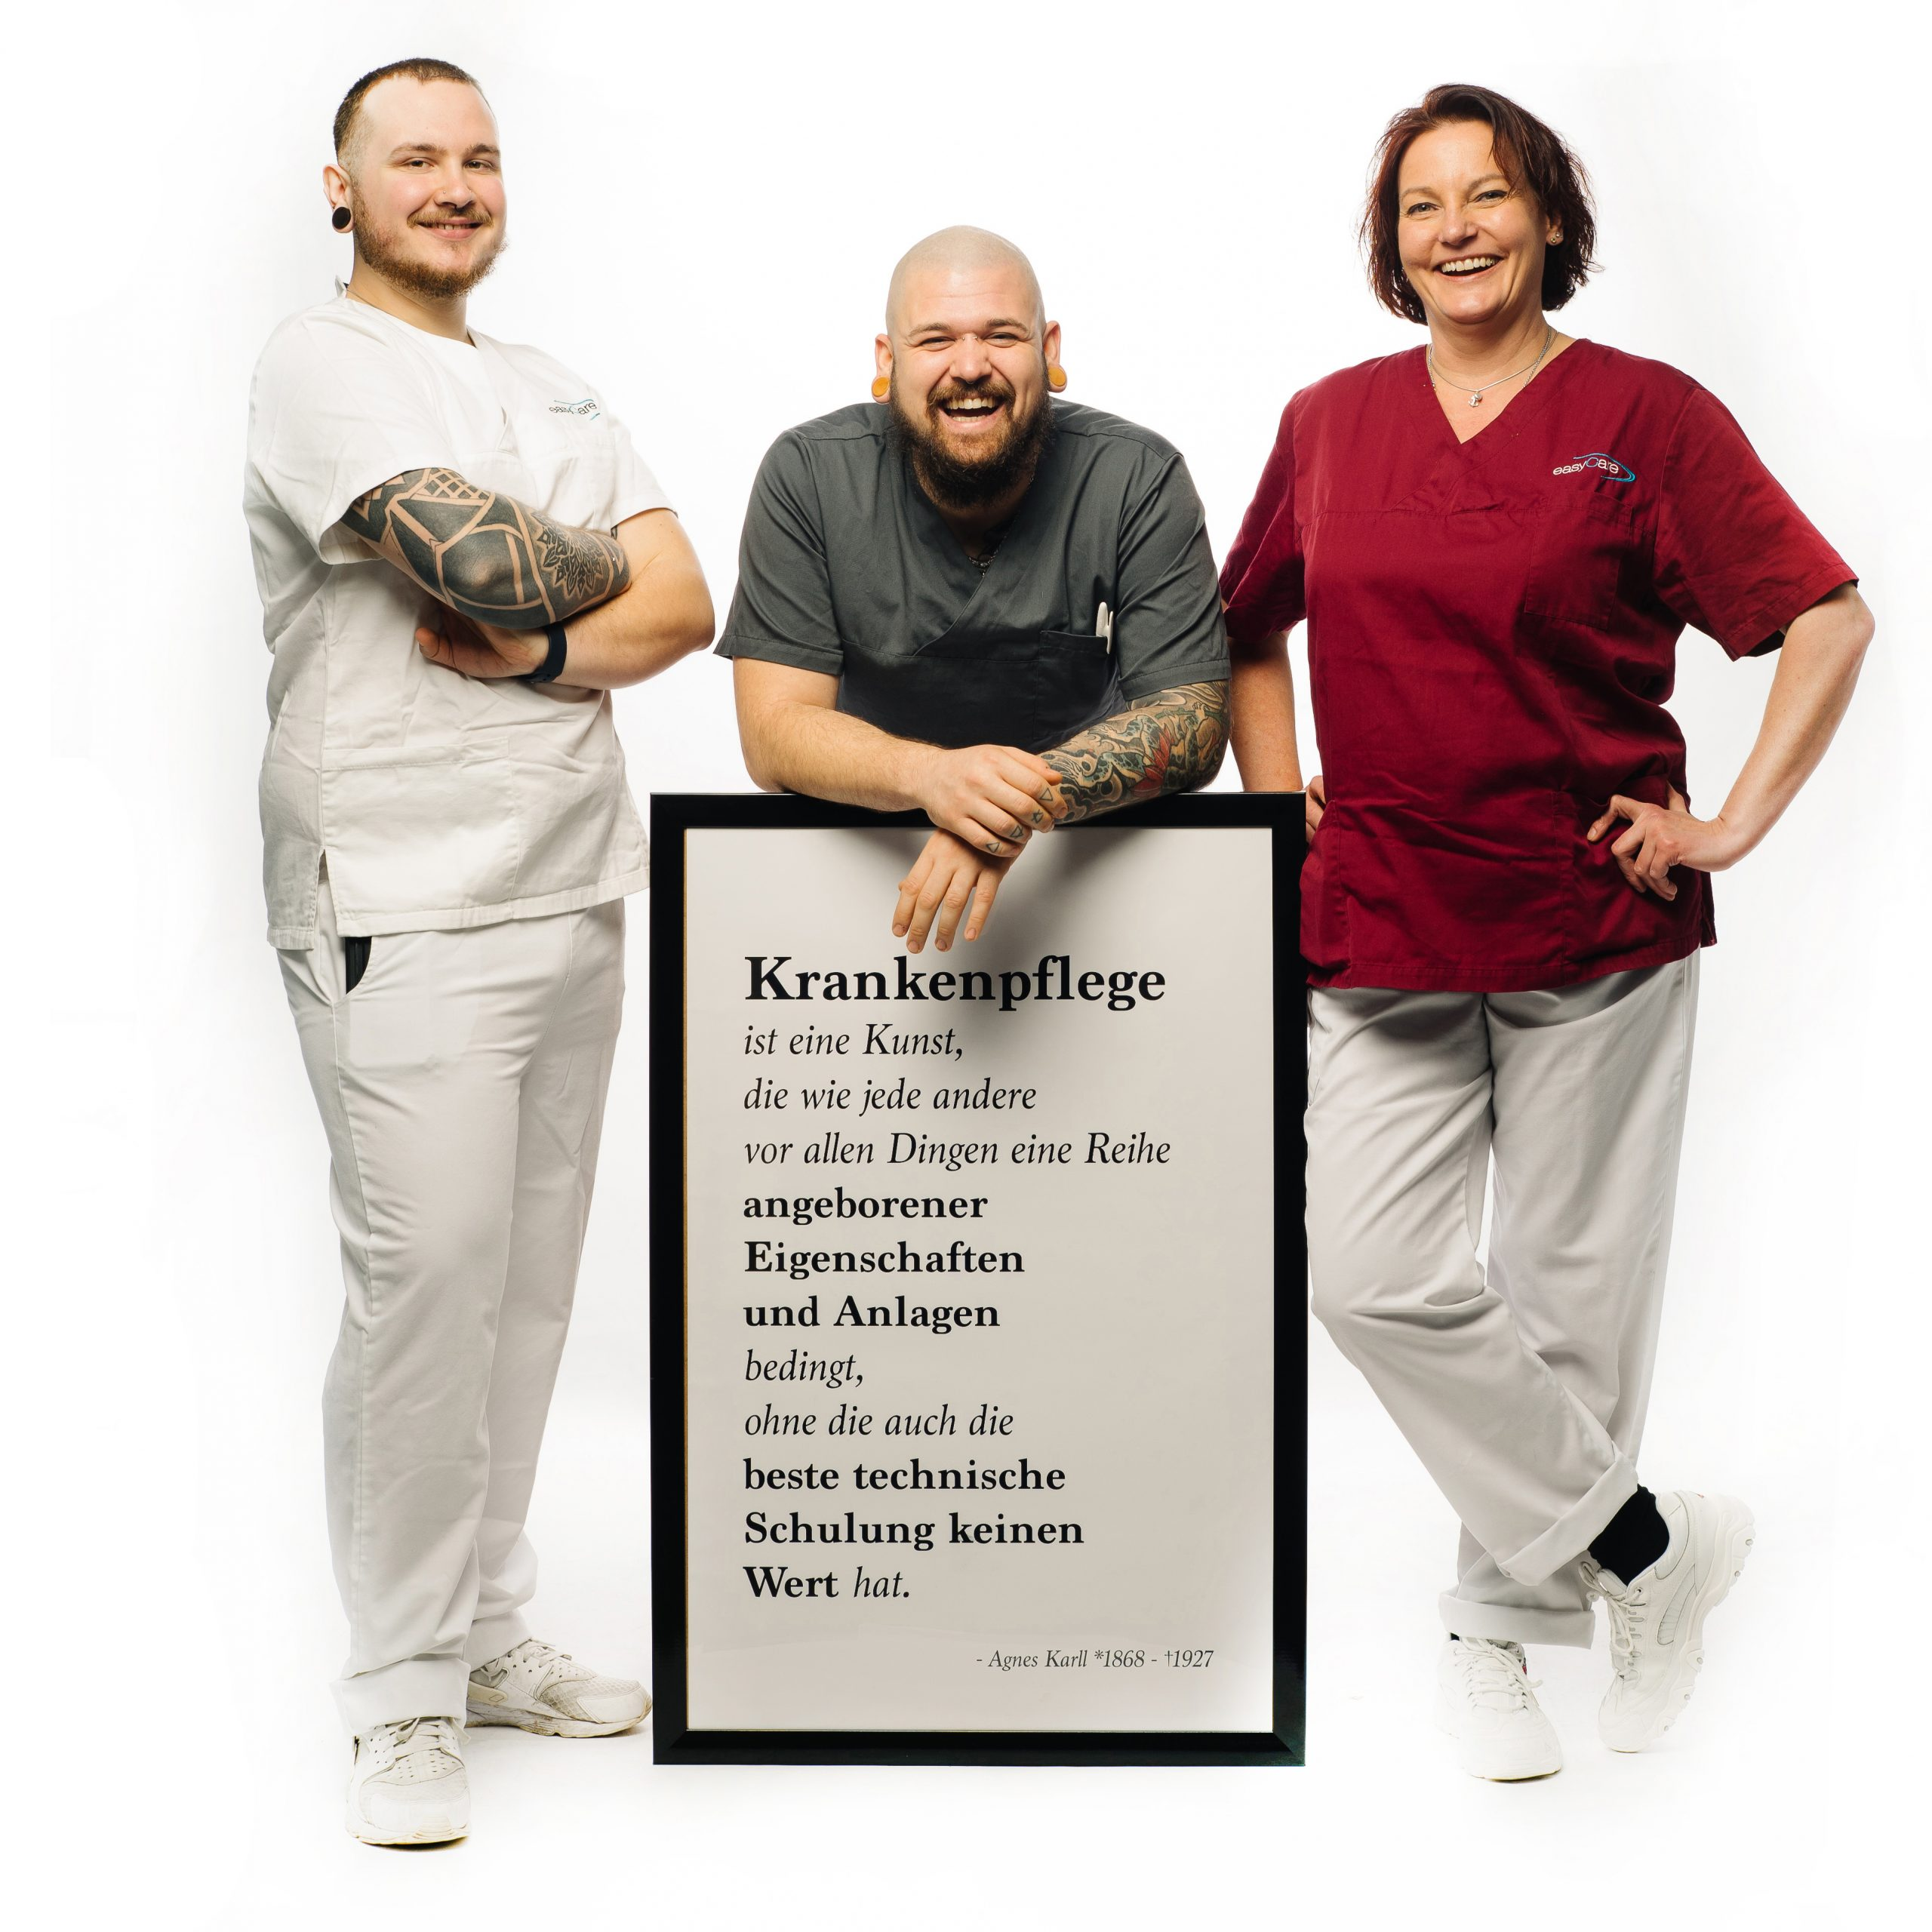 easyCare Pflegepersonal Krankenpflege Krankenpflegerin Krankenpfleger